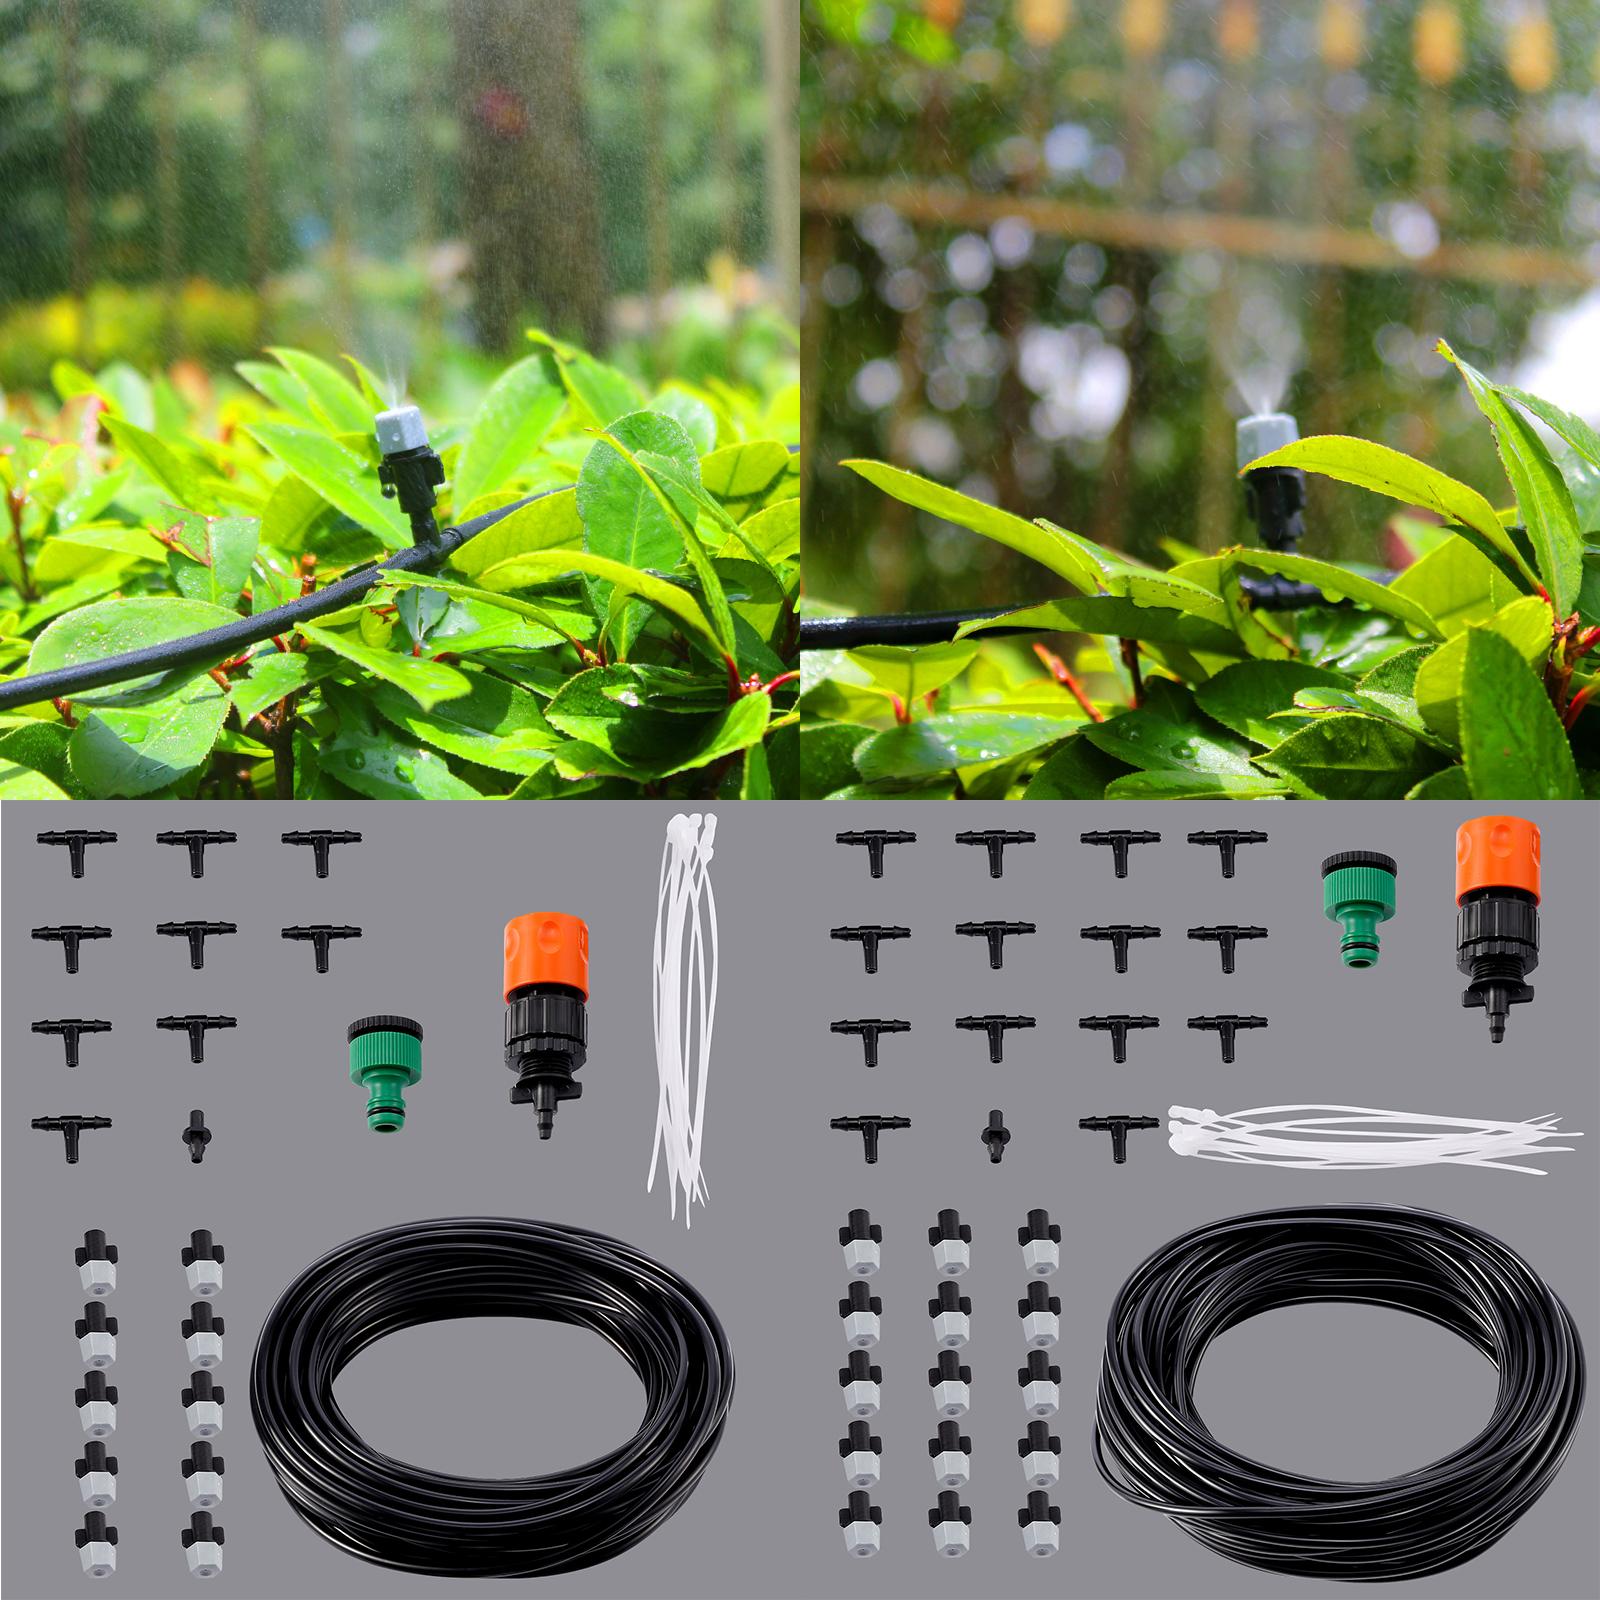 micro drip irrigation system plant self watering garden hose kit